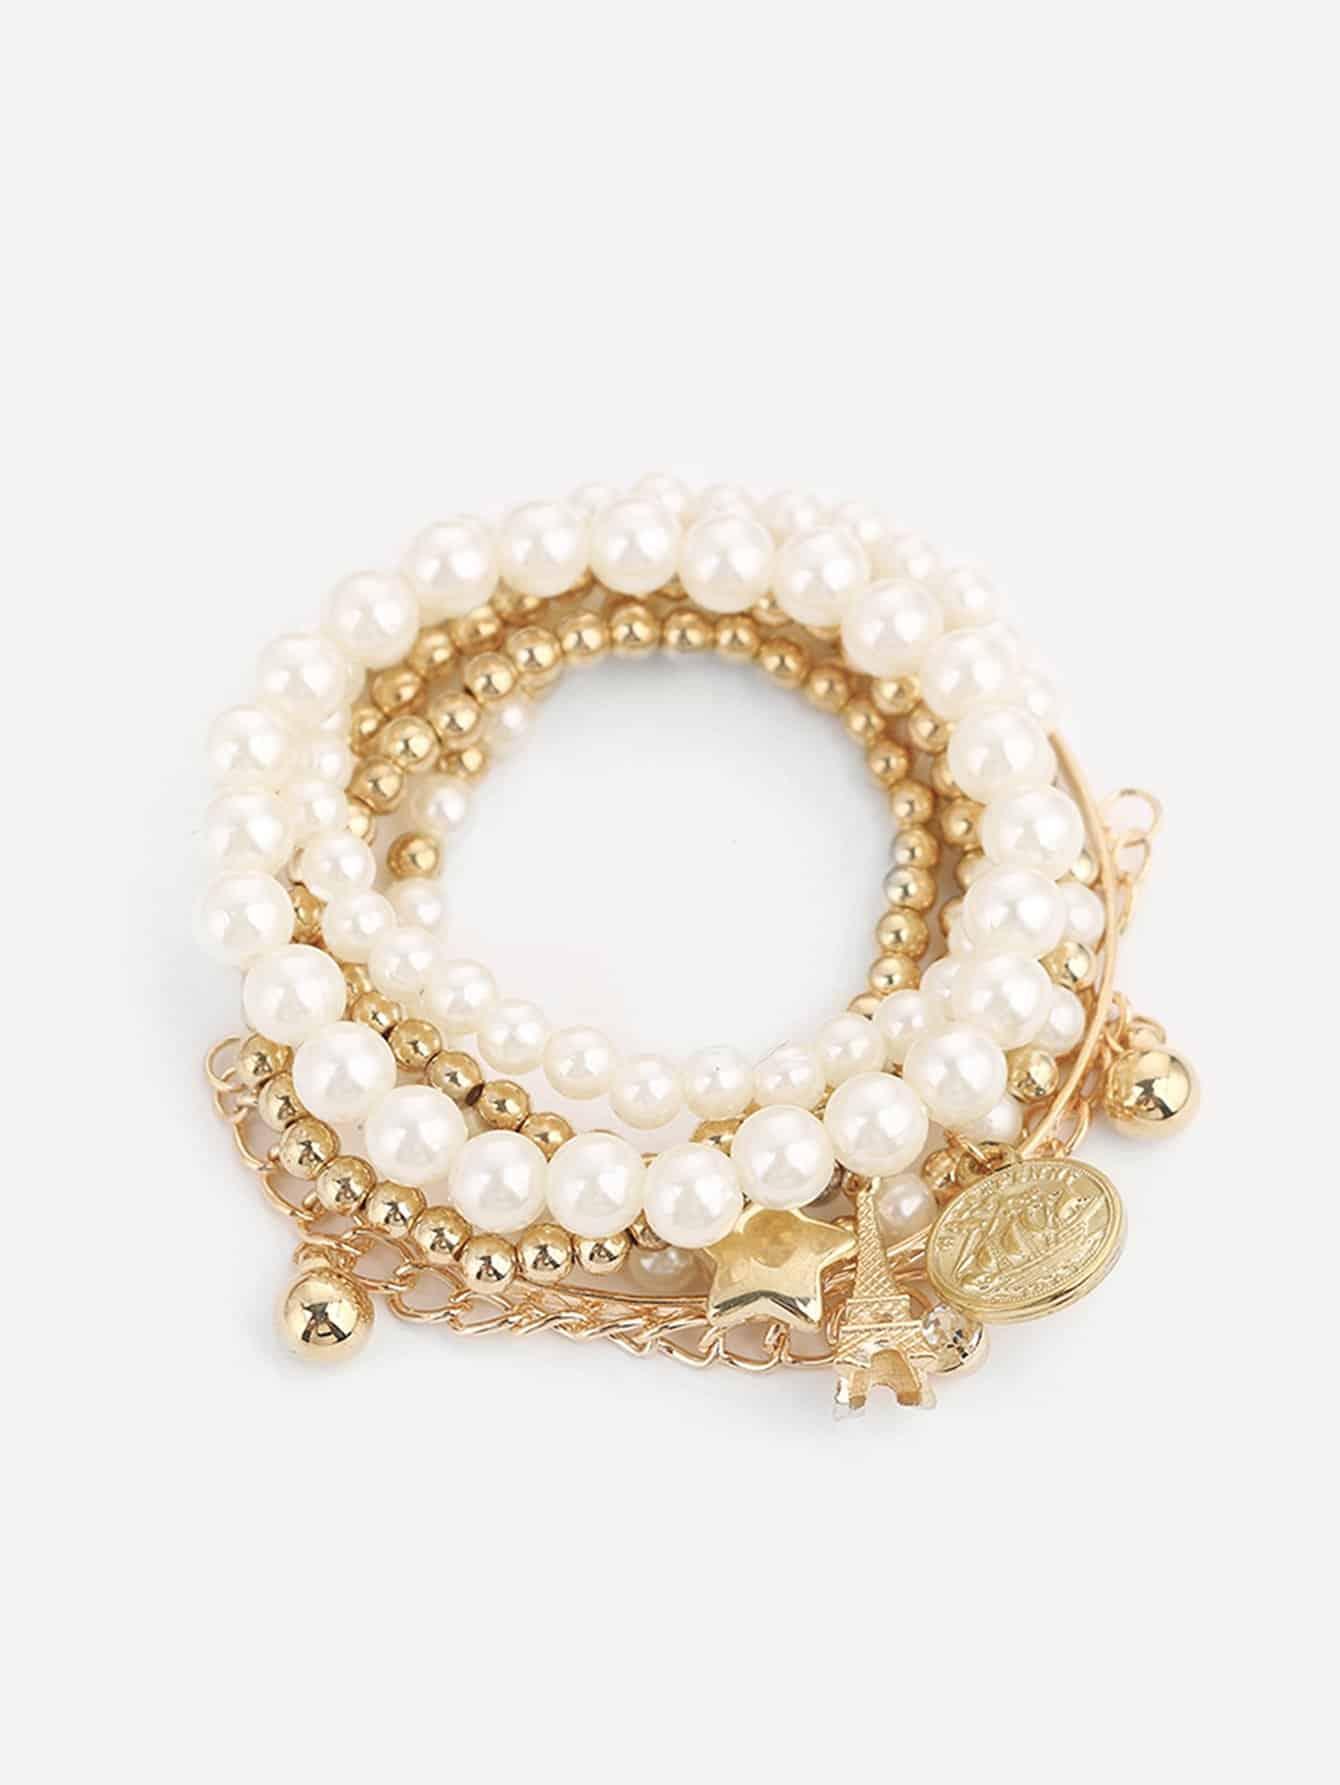 Beads Armband Set mit Kunstperlen 6pcs